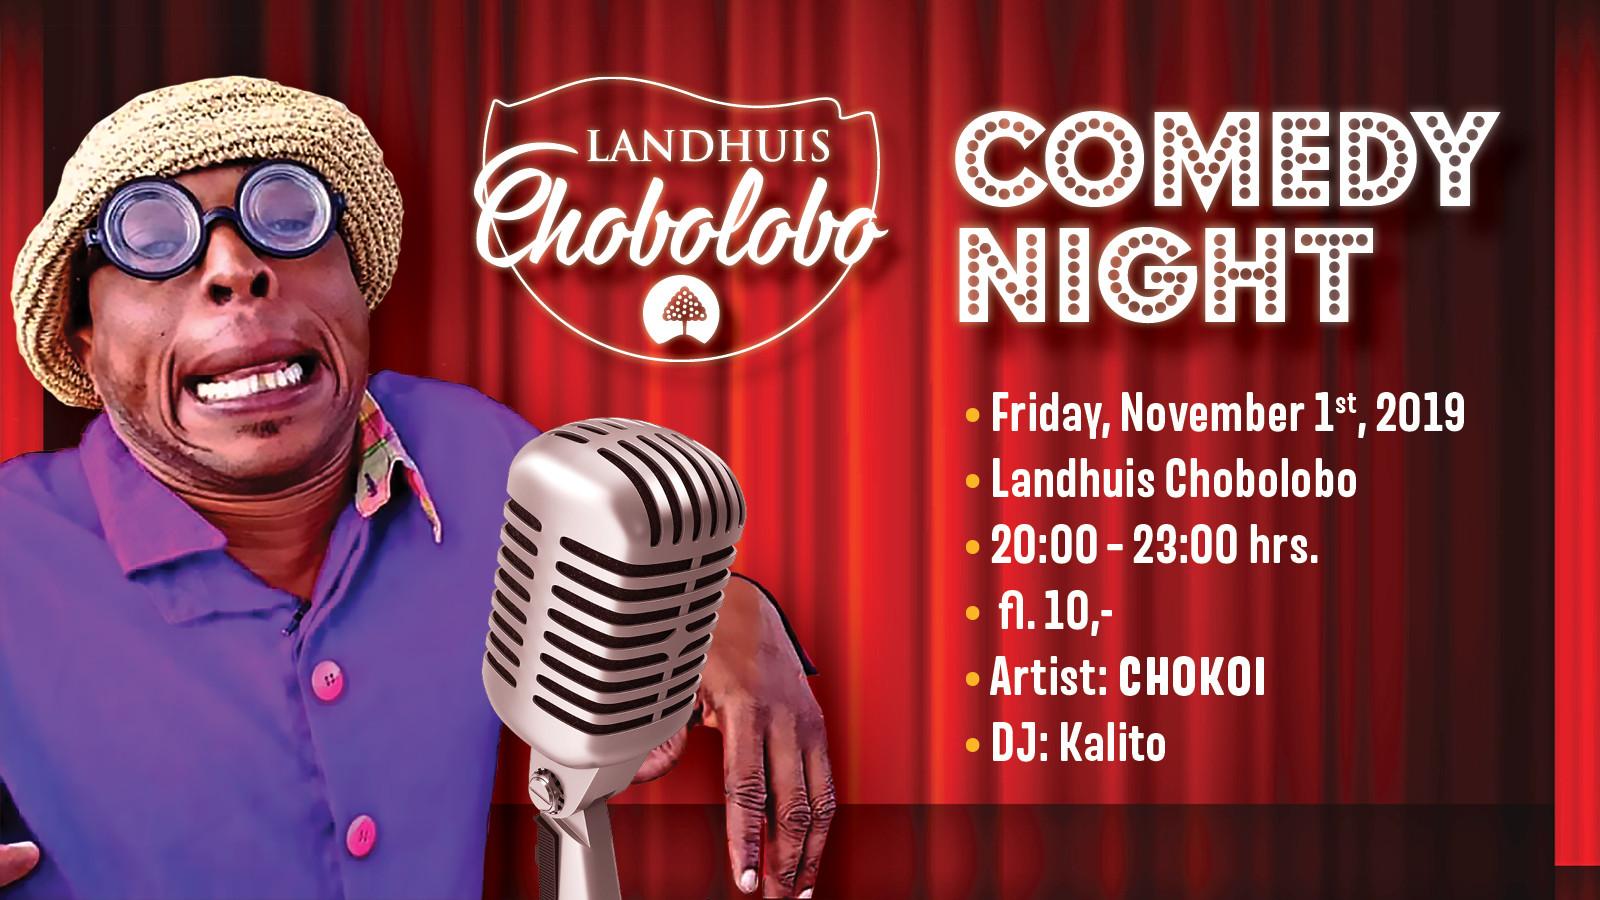 Chobolobo events